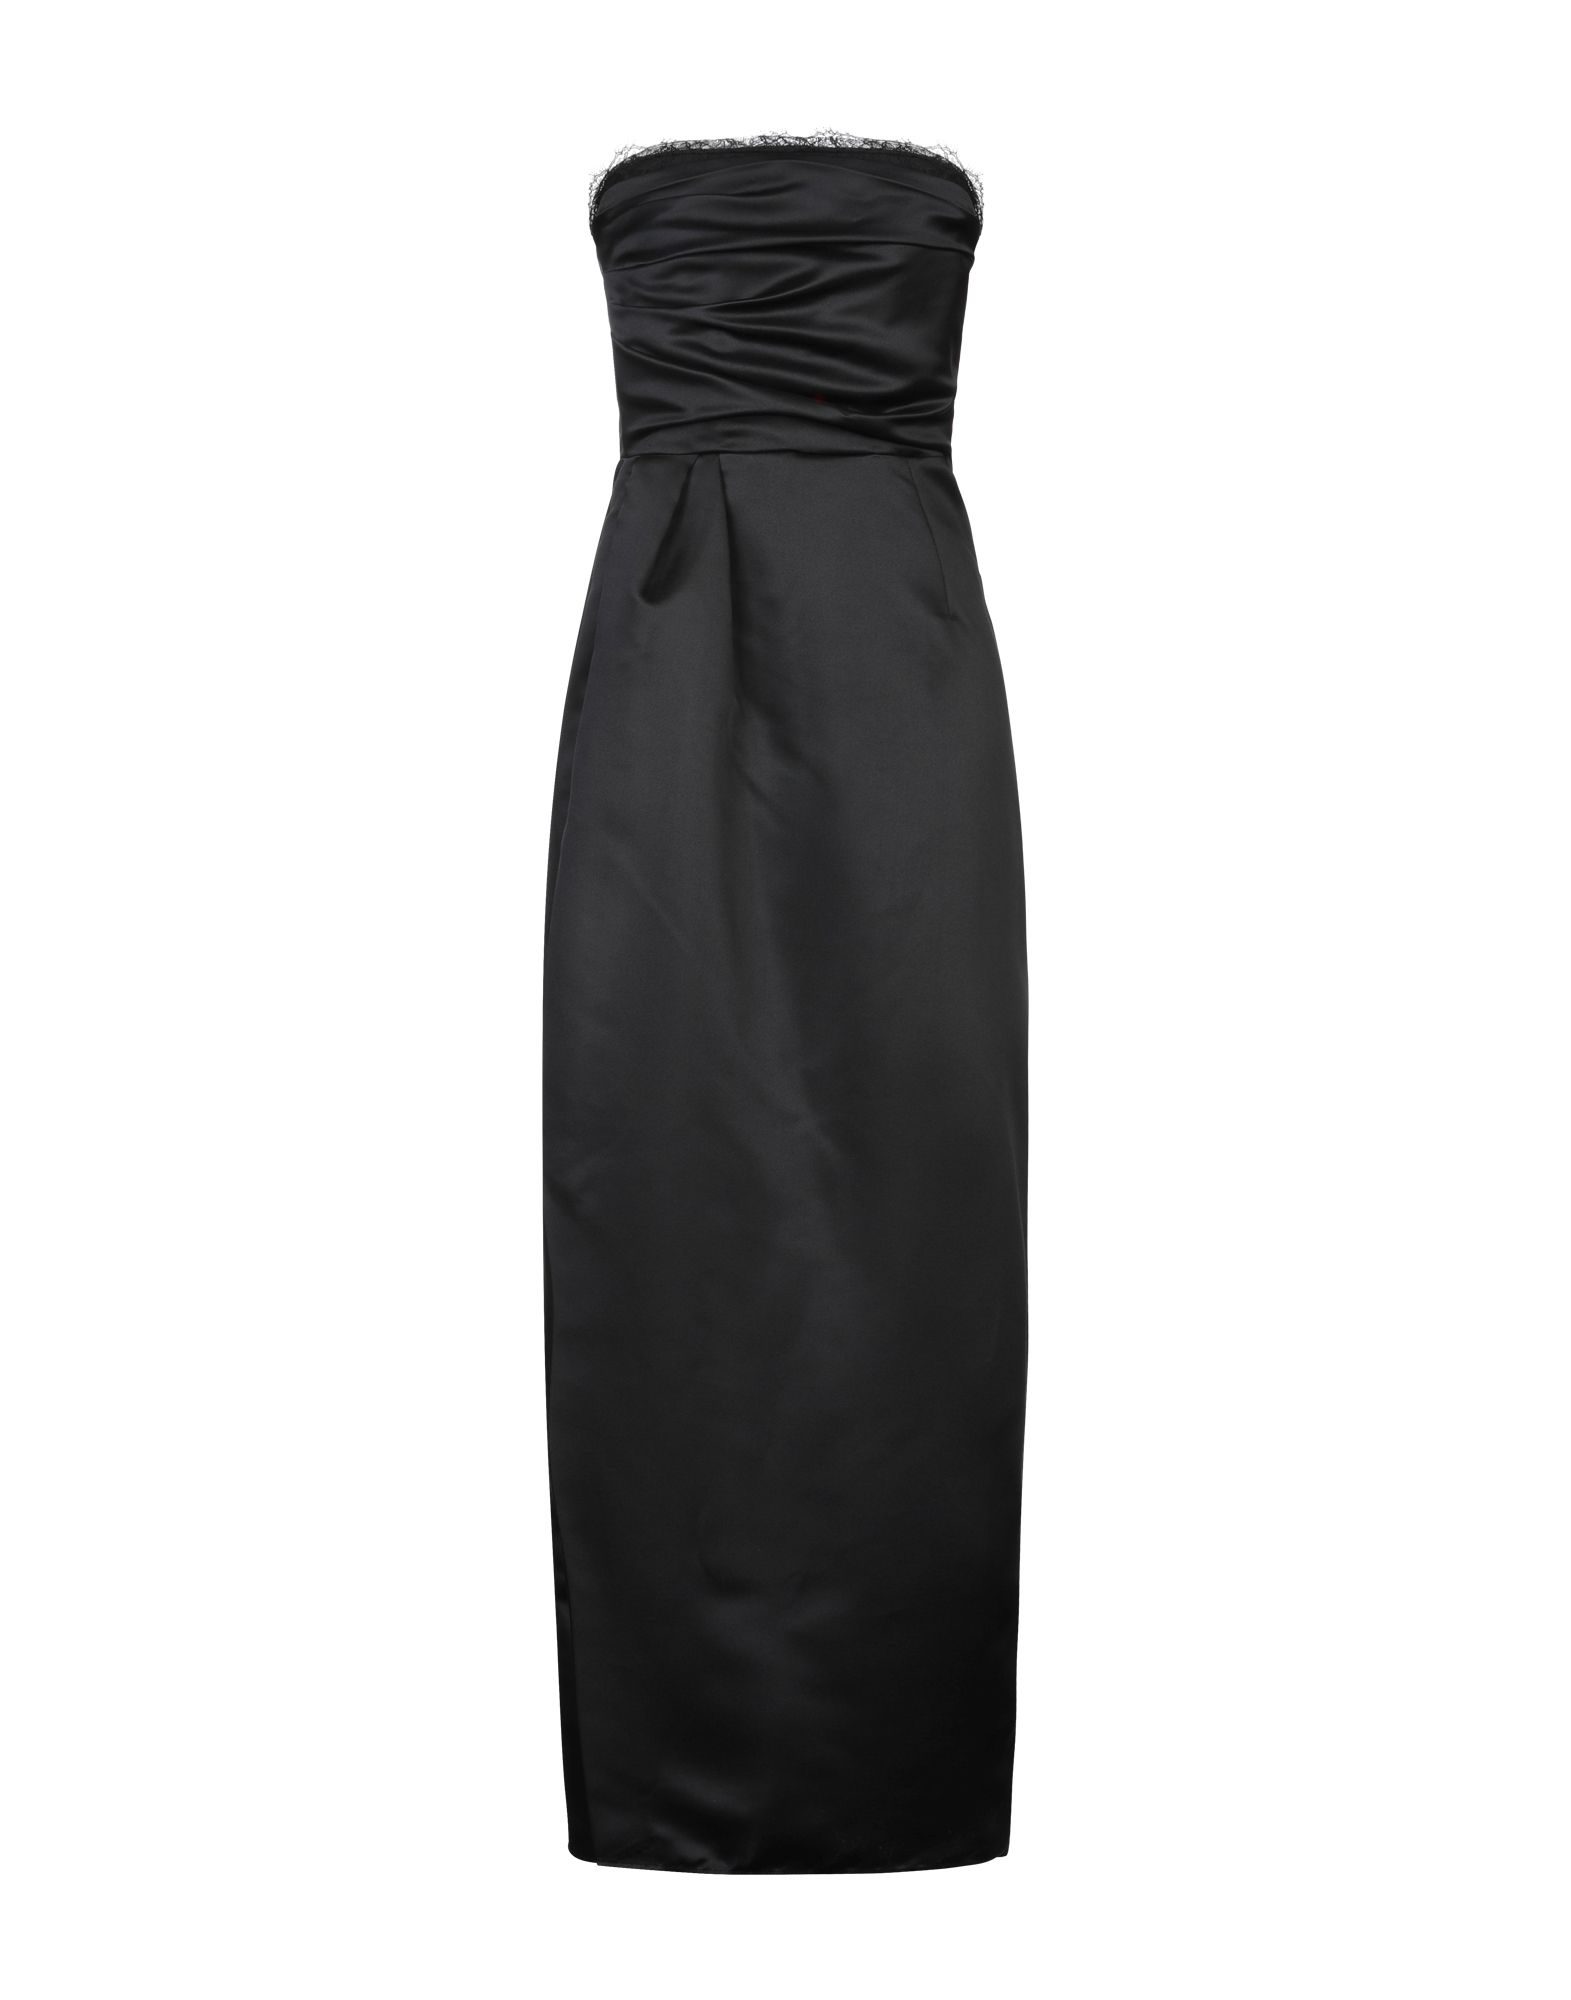 ANNA RACHELE BLACK LABEL Длинное платье anna rachele black label длинное платье